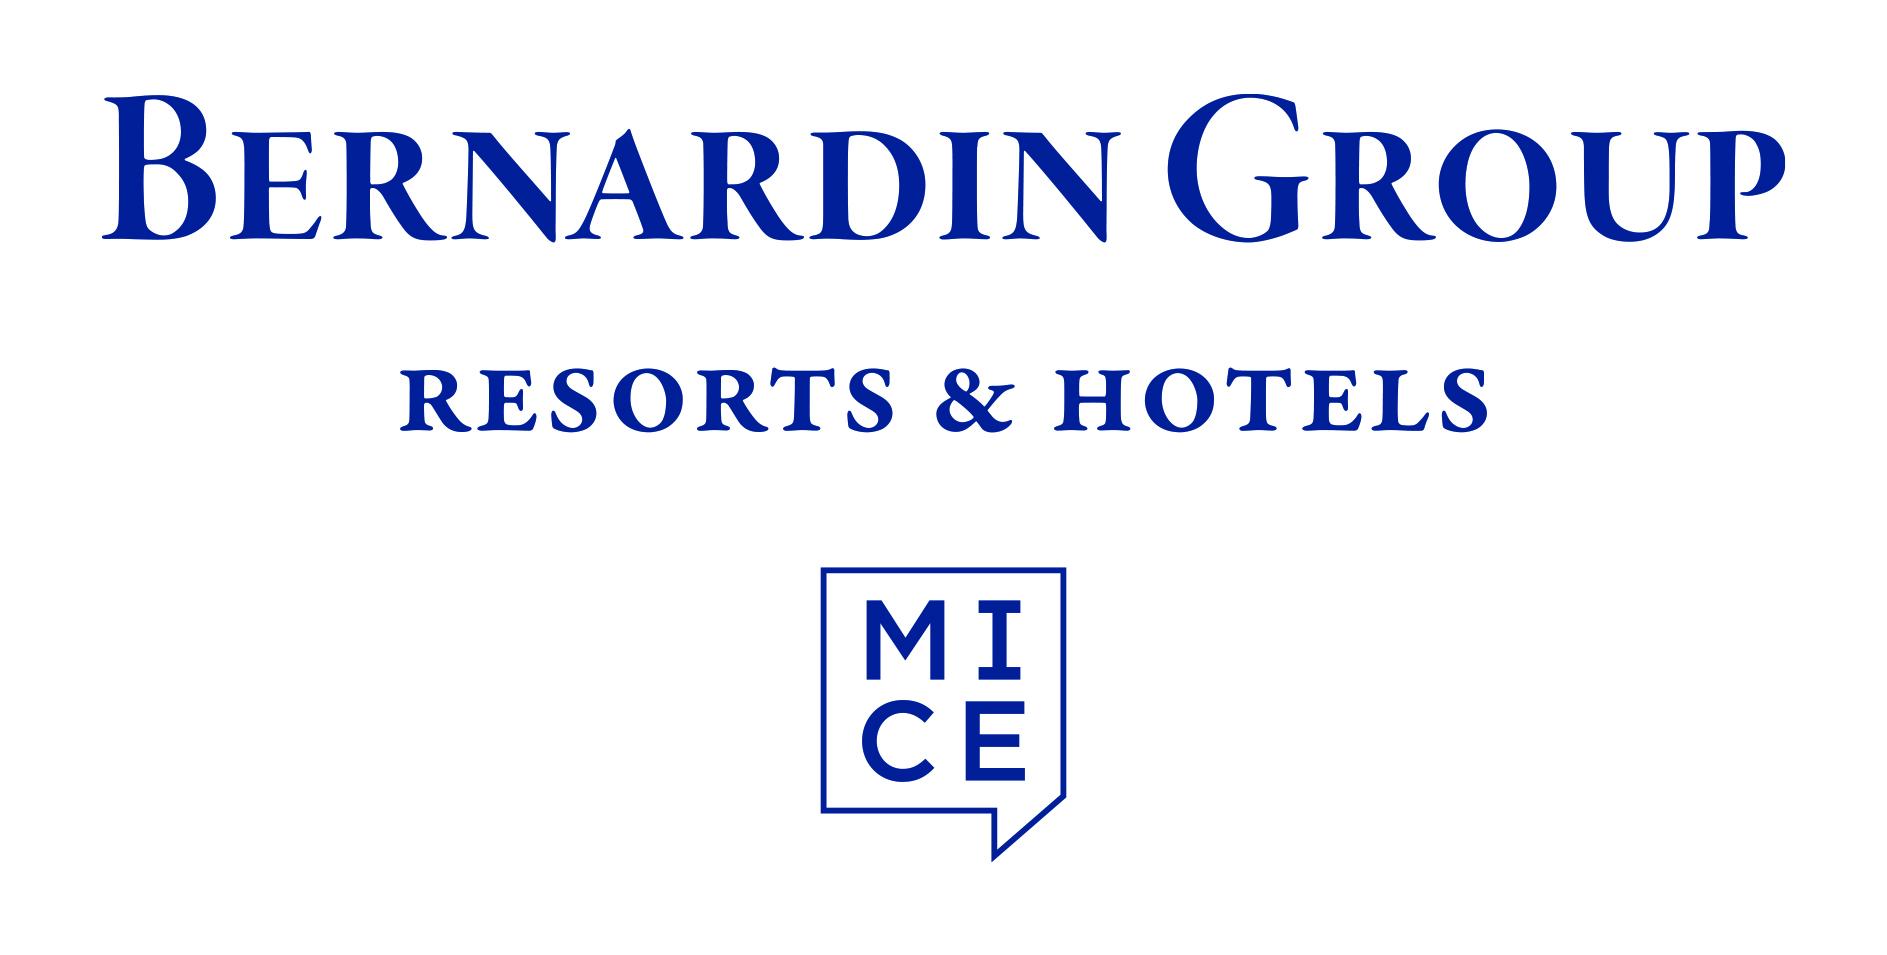 BERNARDIN GROUP – RESORTS & HOTELS Image